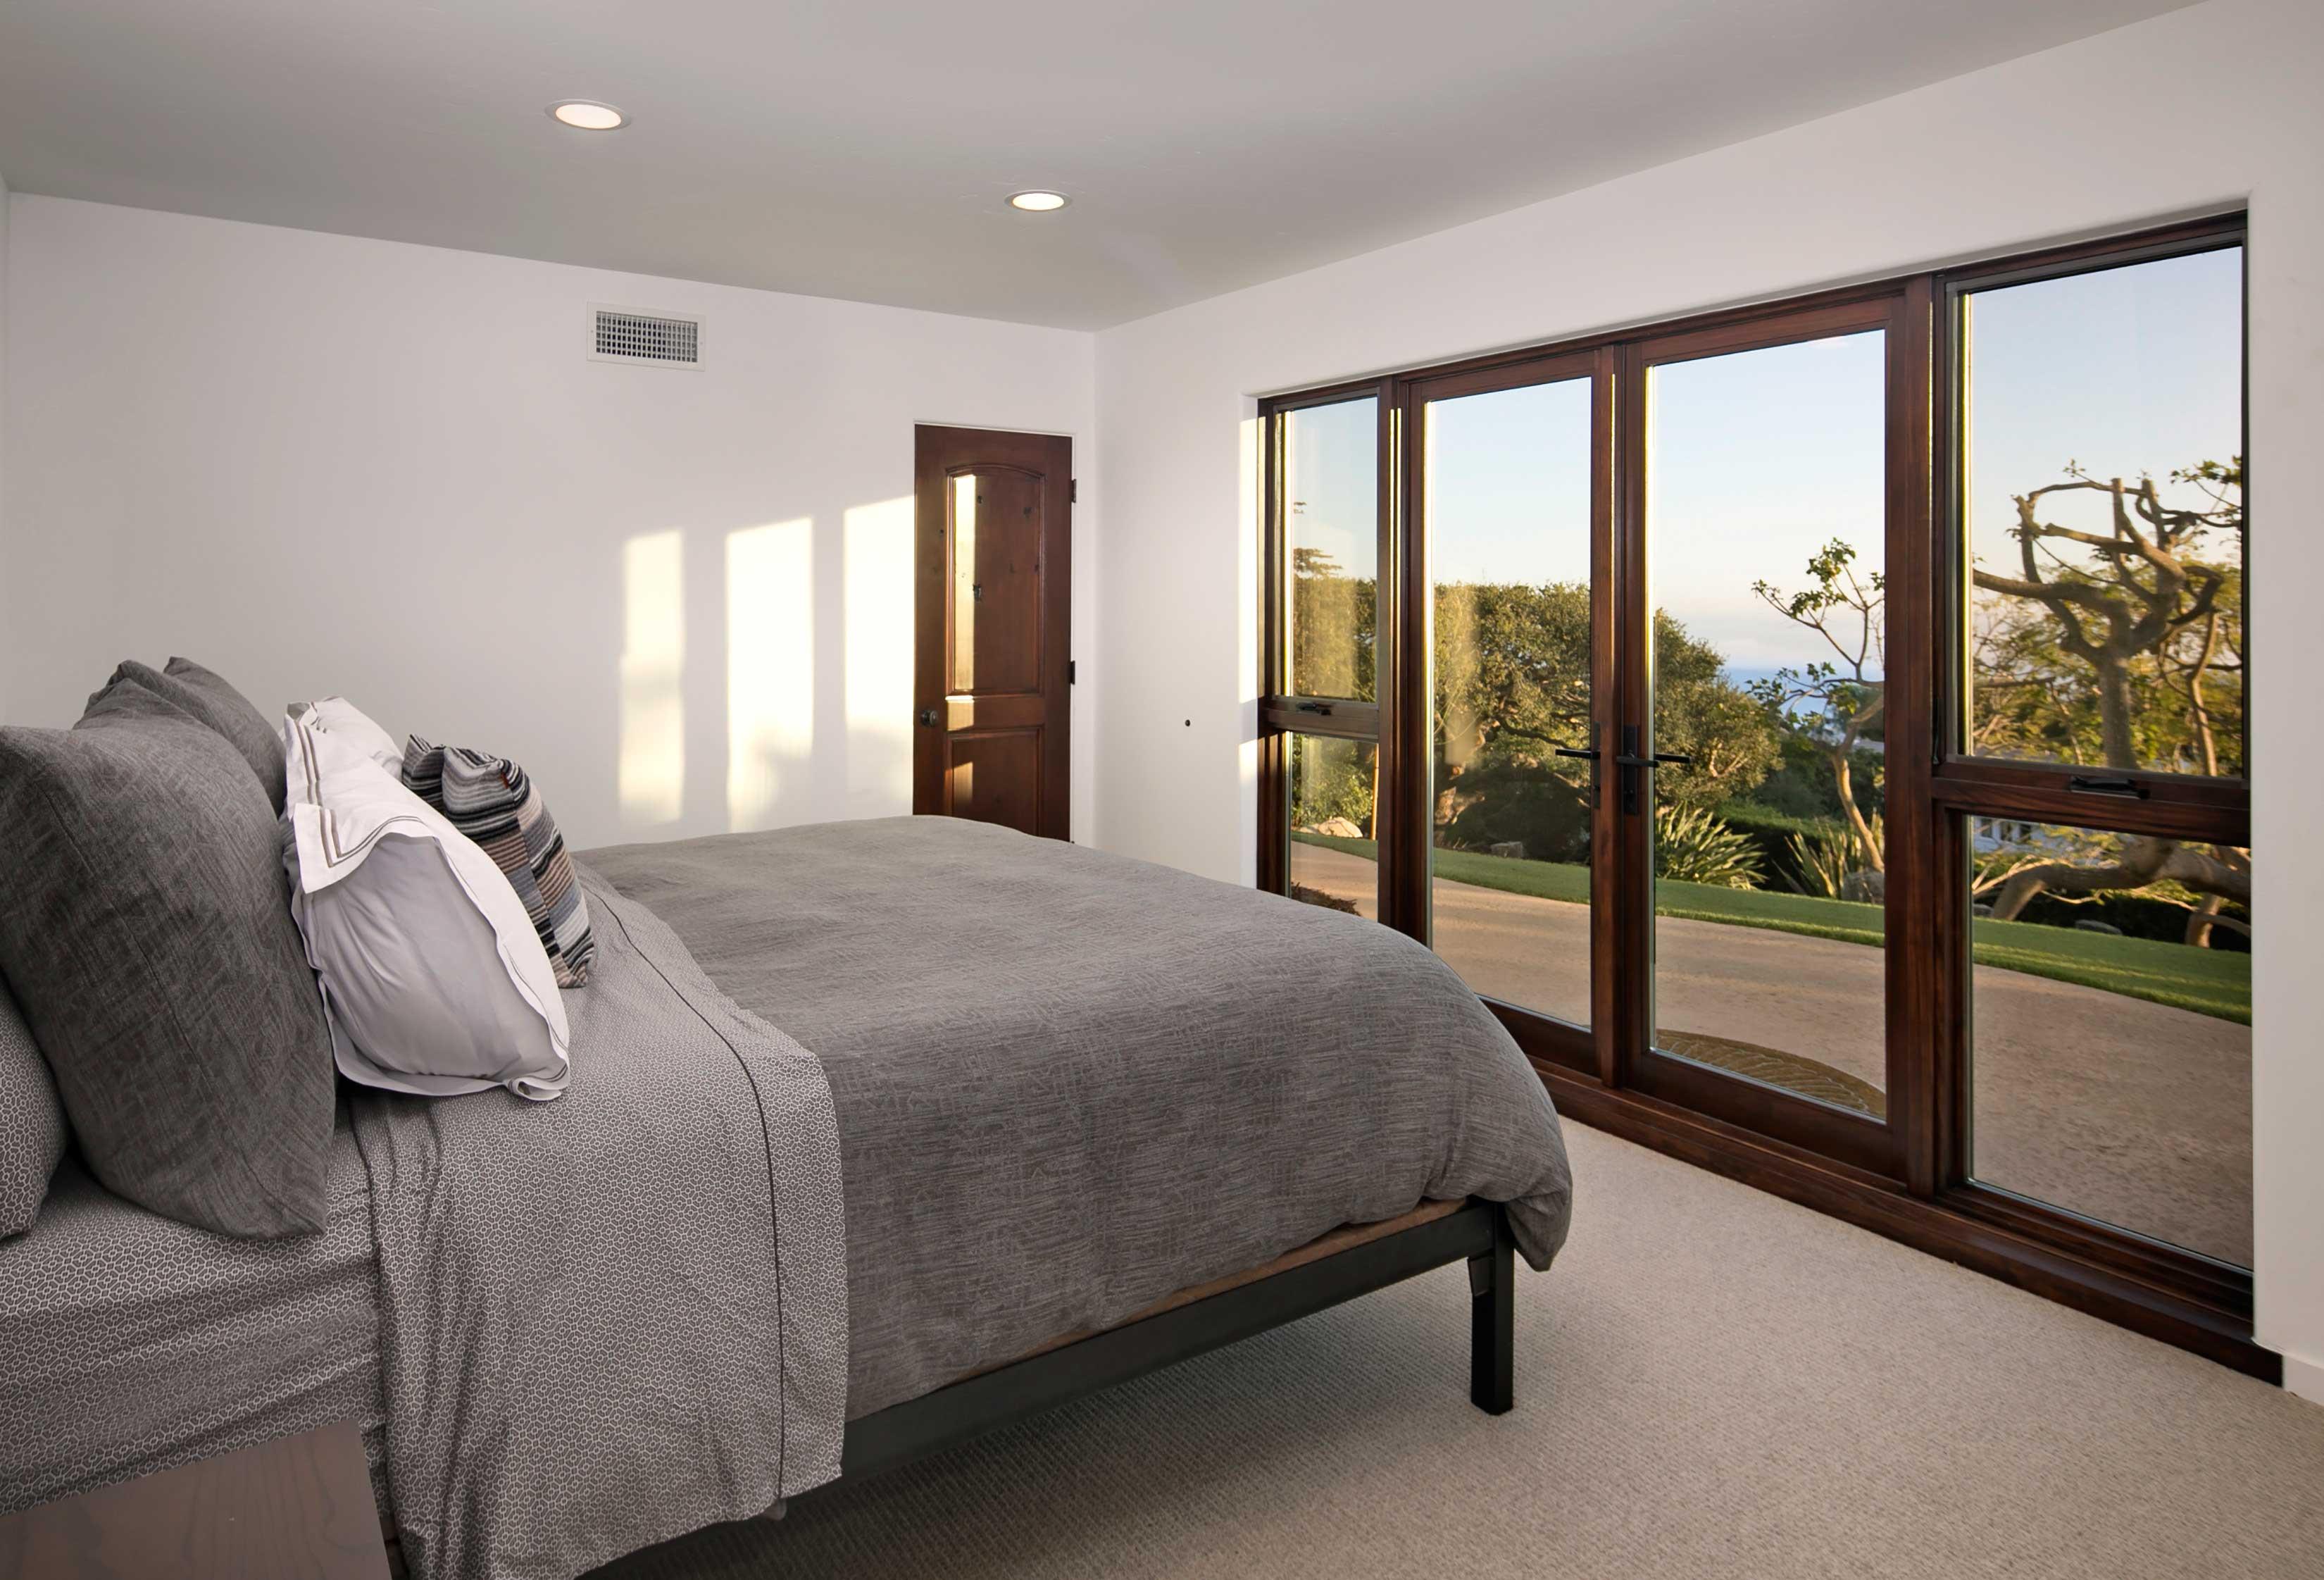 Gordobe_Homes_High-Ridge-bed-room